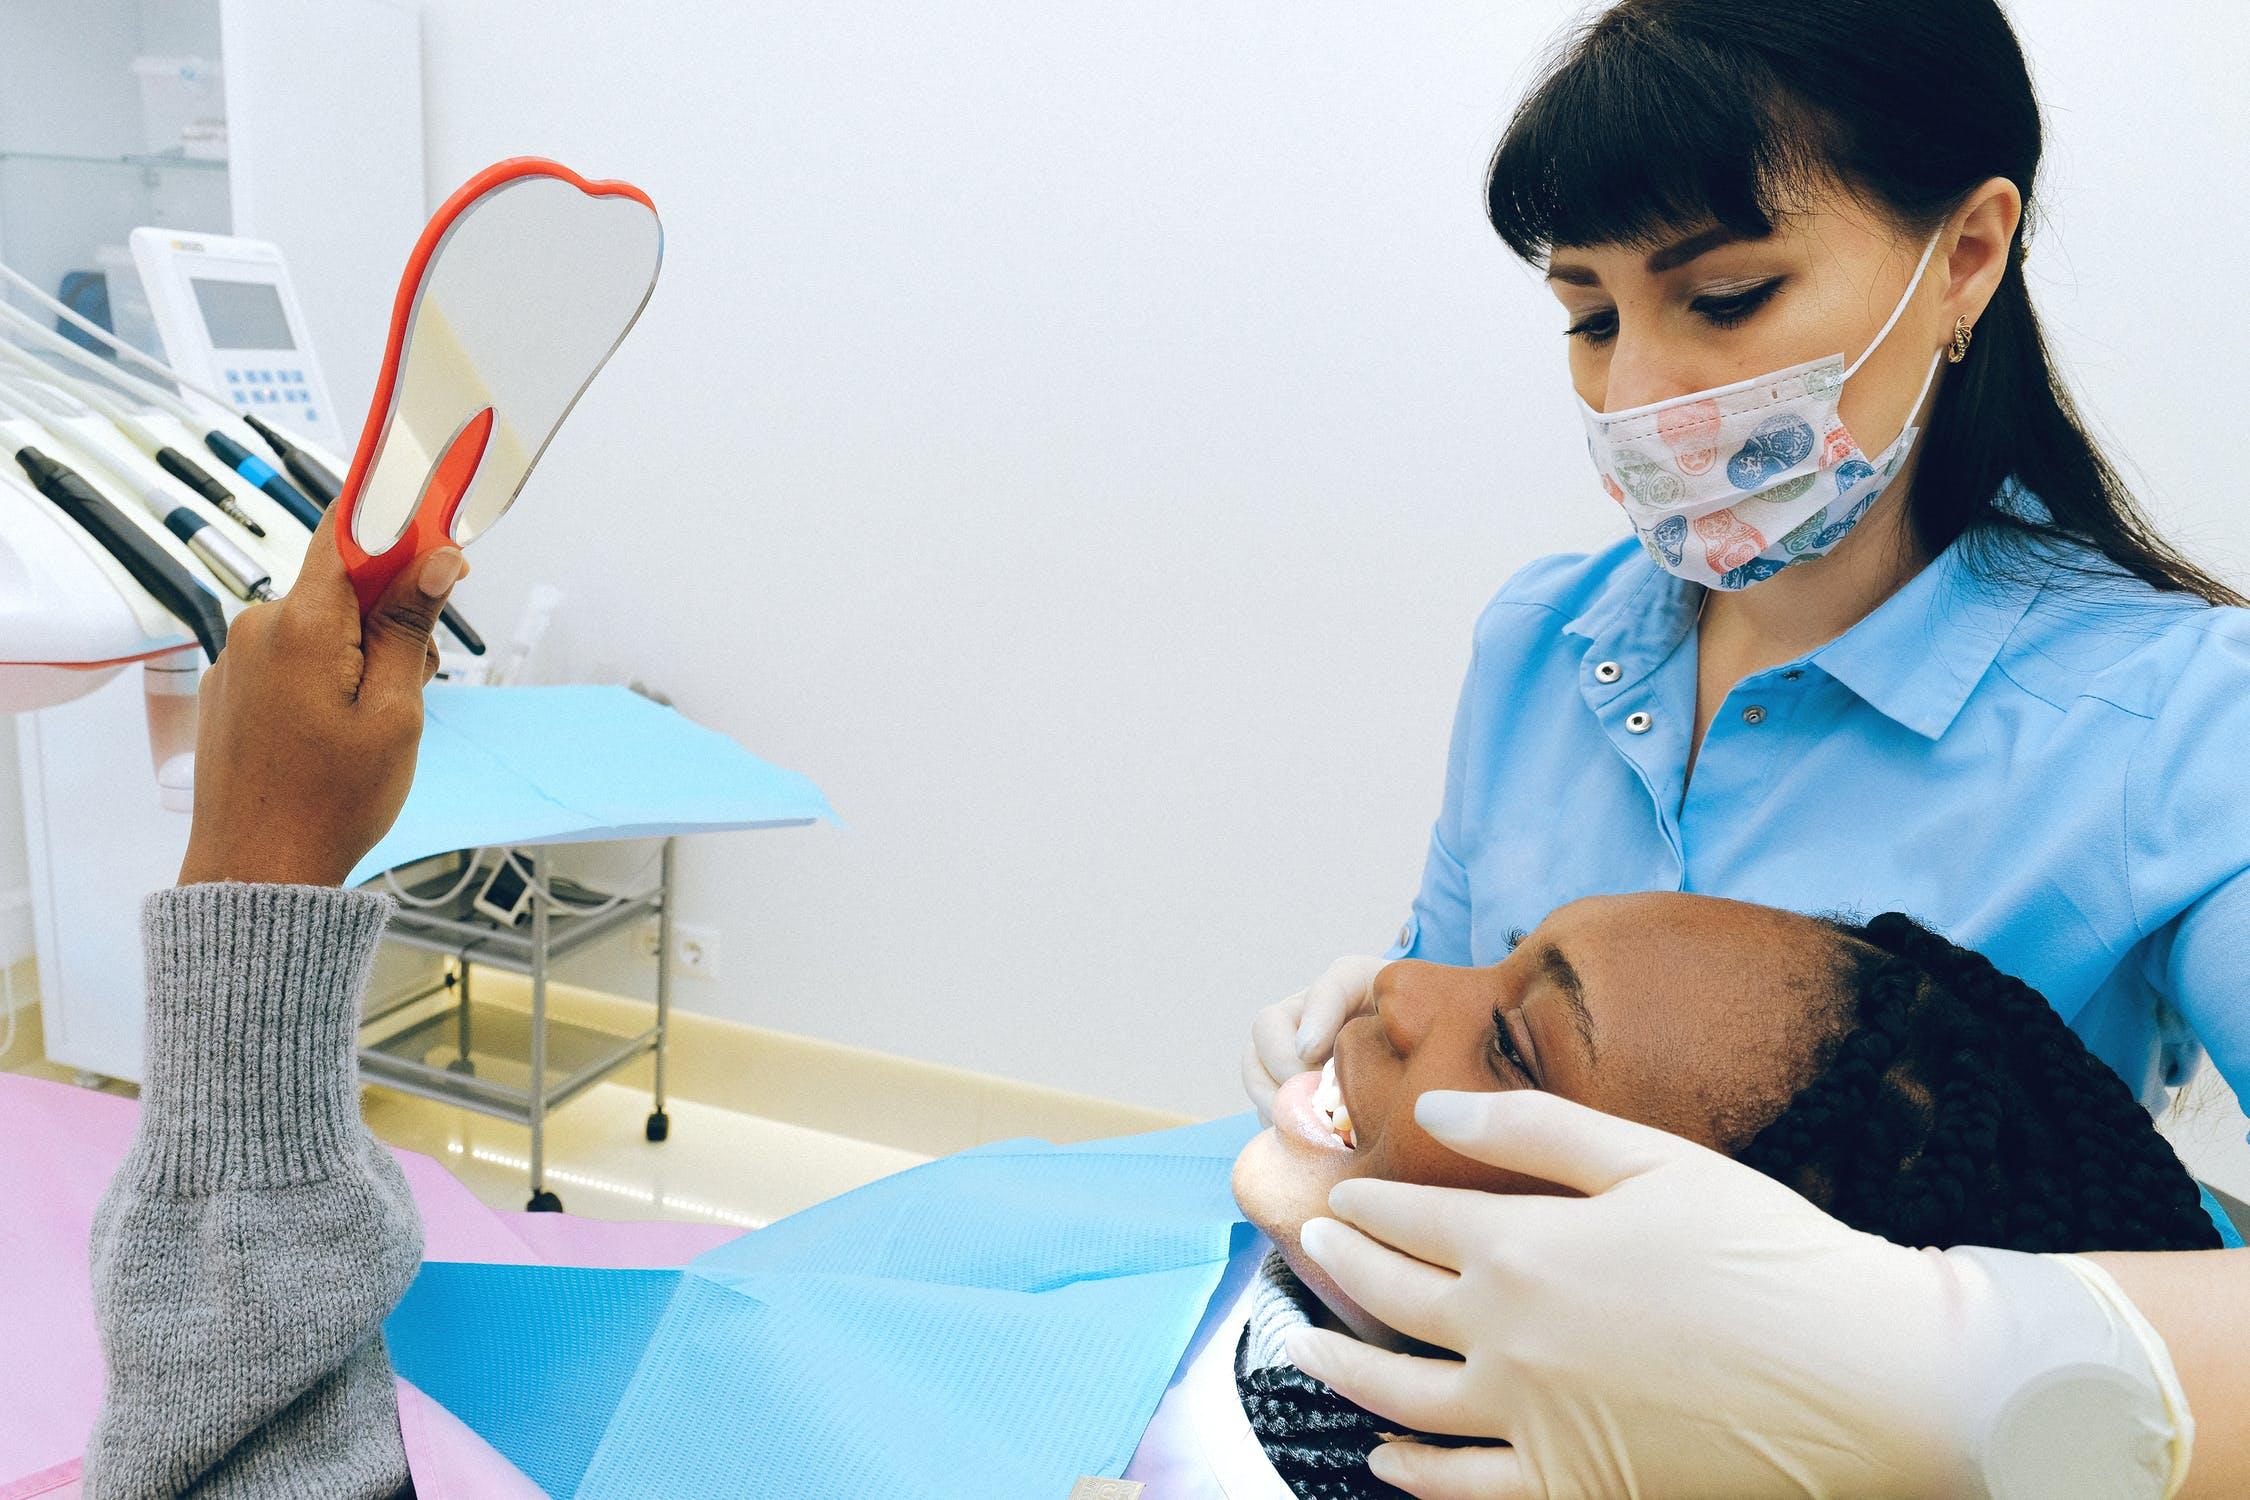 tandblekning i uppsala